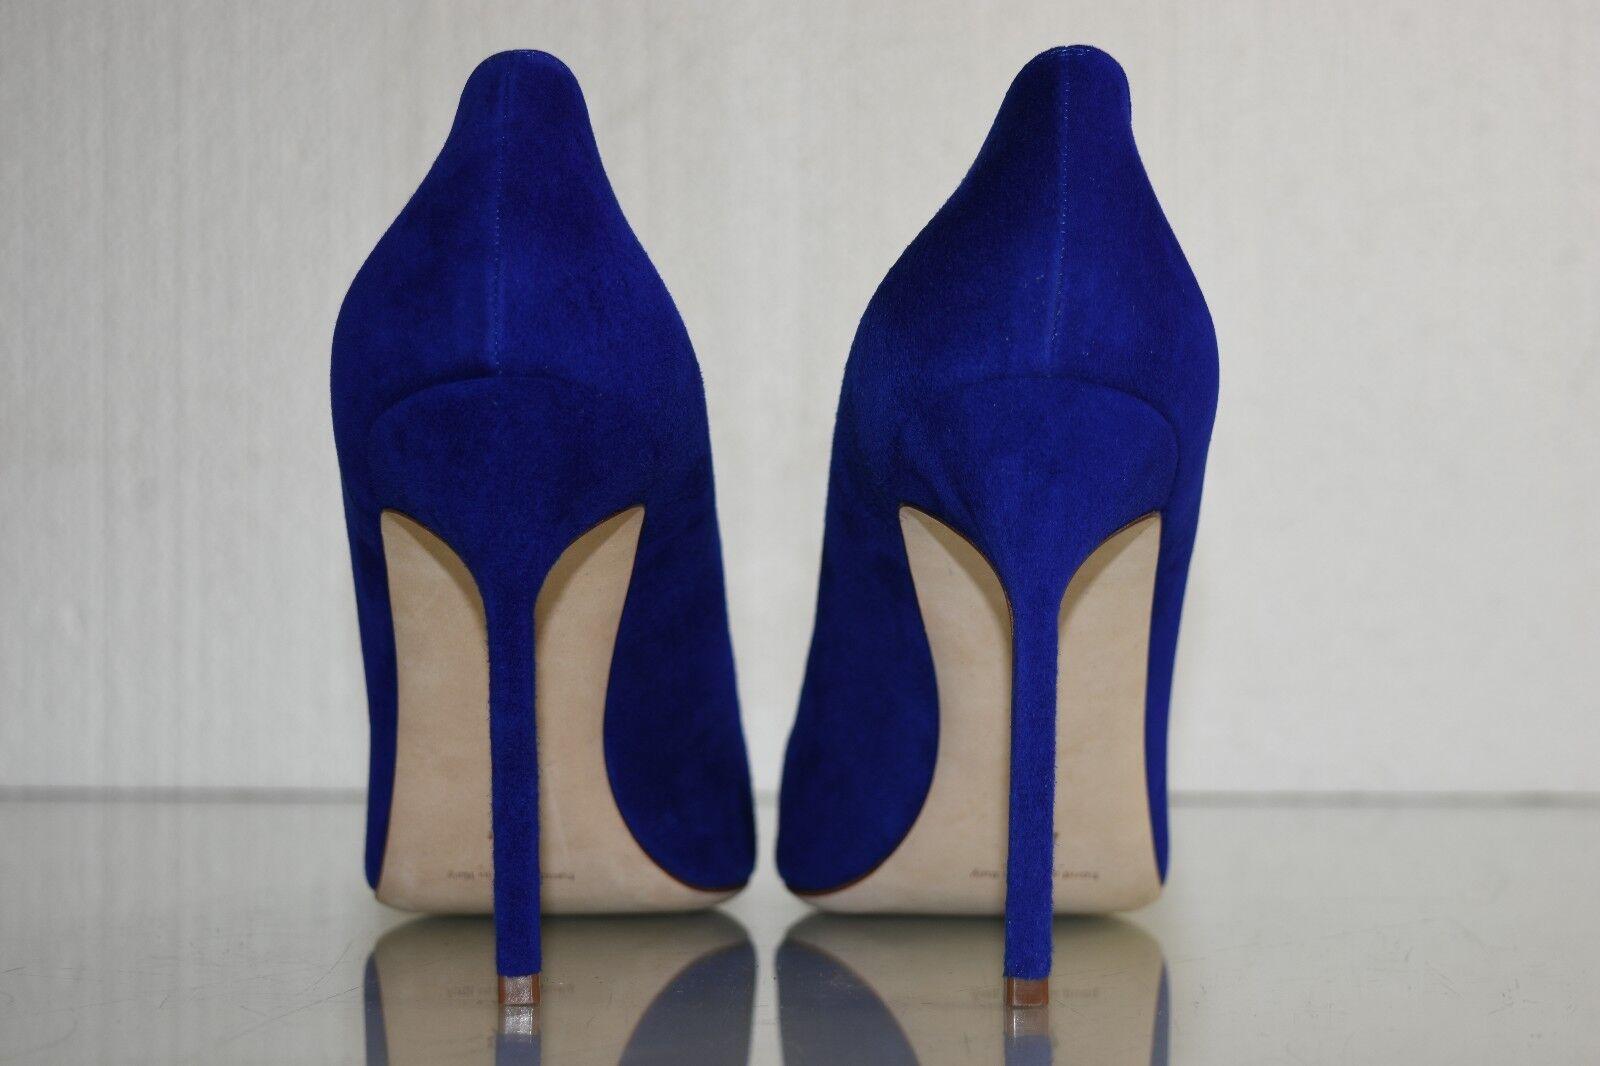 Neu Manolo Blahnik Bb Bb Bb 105 Blau Wildleder Absätze Königsblau Kobalt Pumps Schuhe 7d5b58